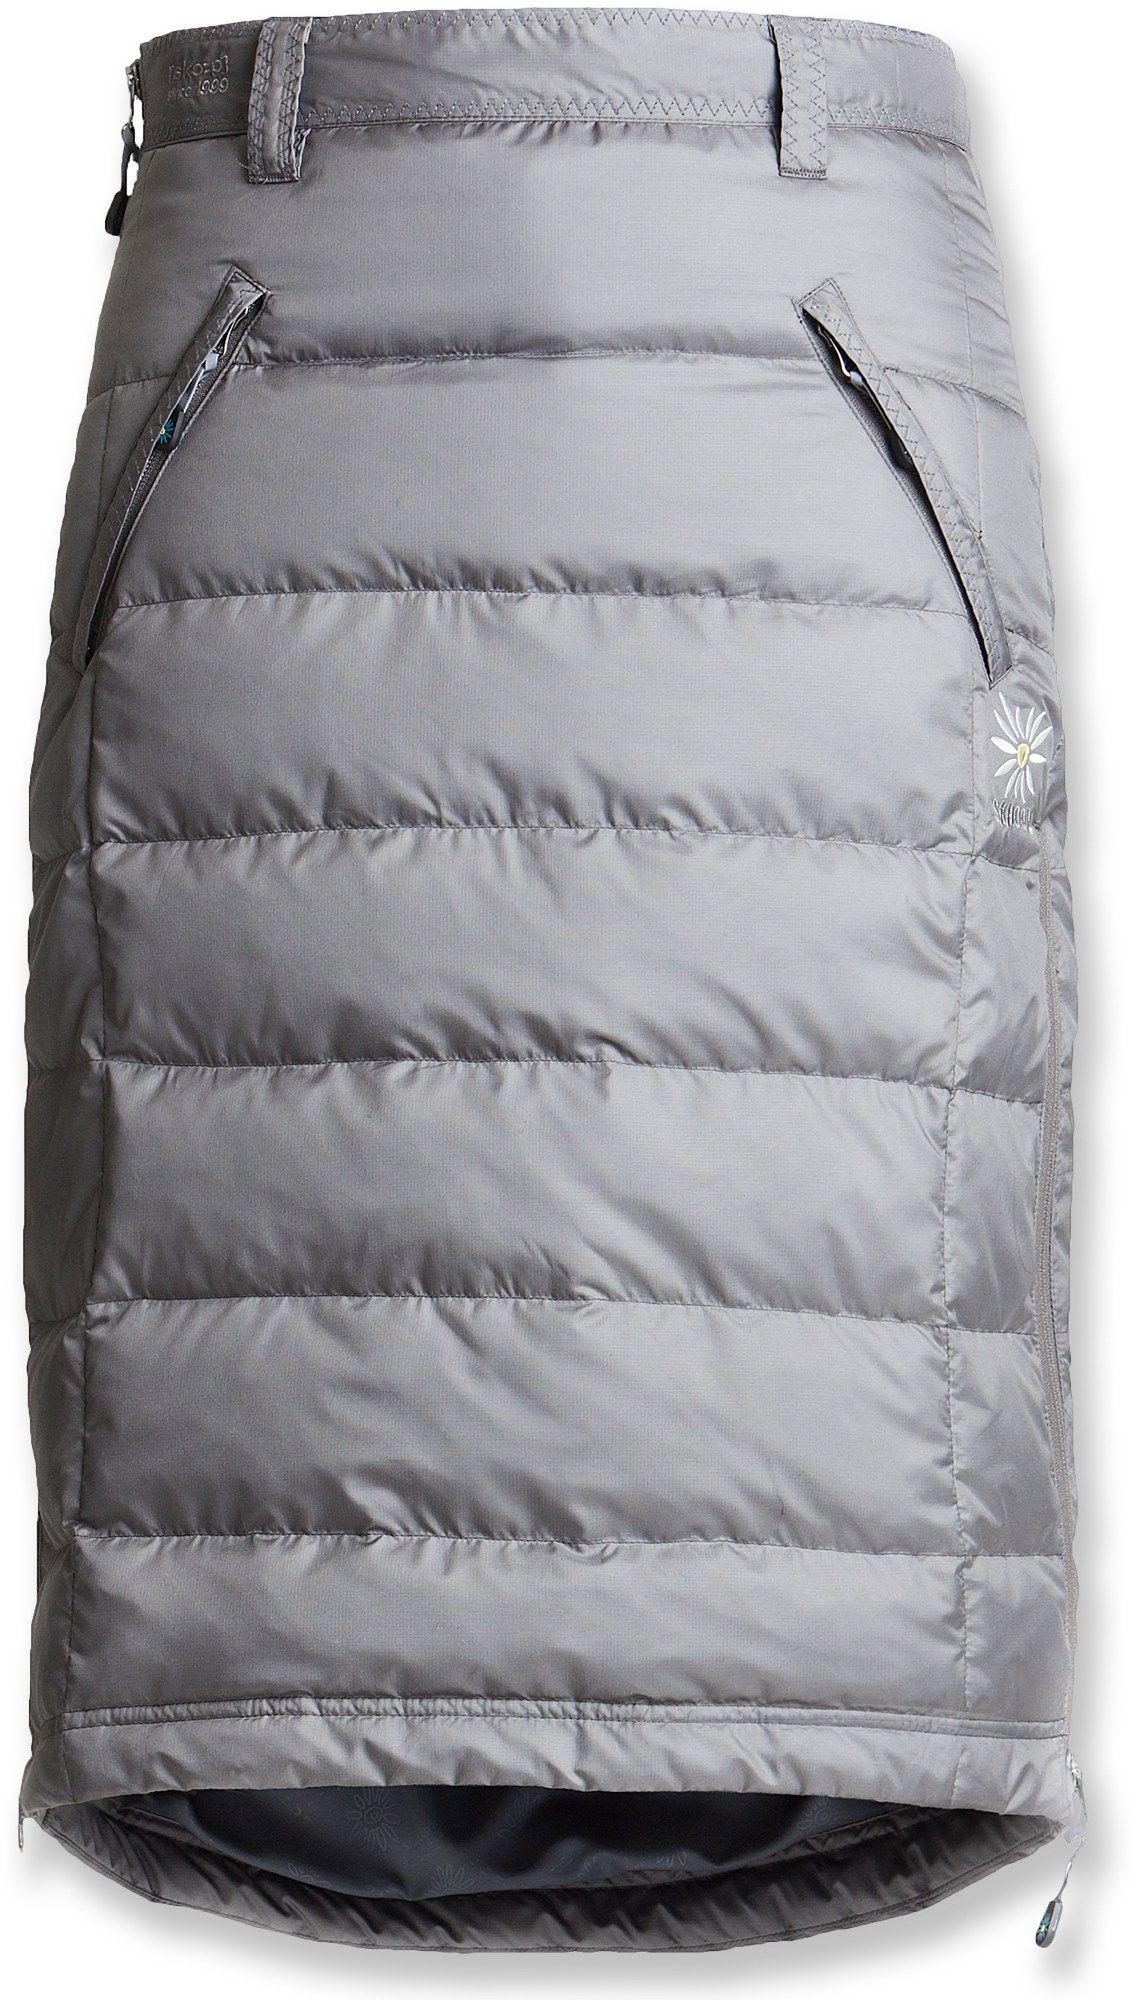 Skhoop Mid Down Skirt Rei It S Like Wearing Your Sleeping Bag Everywhere I Must Get One